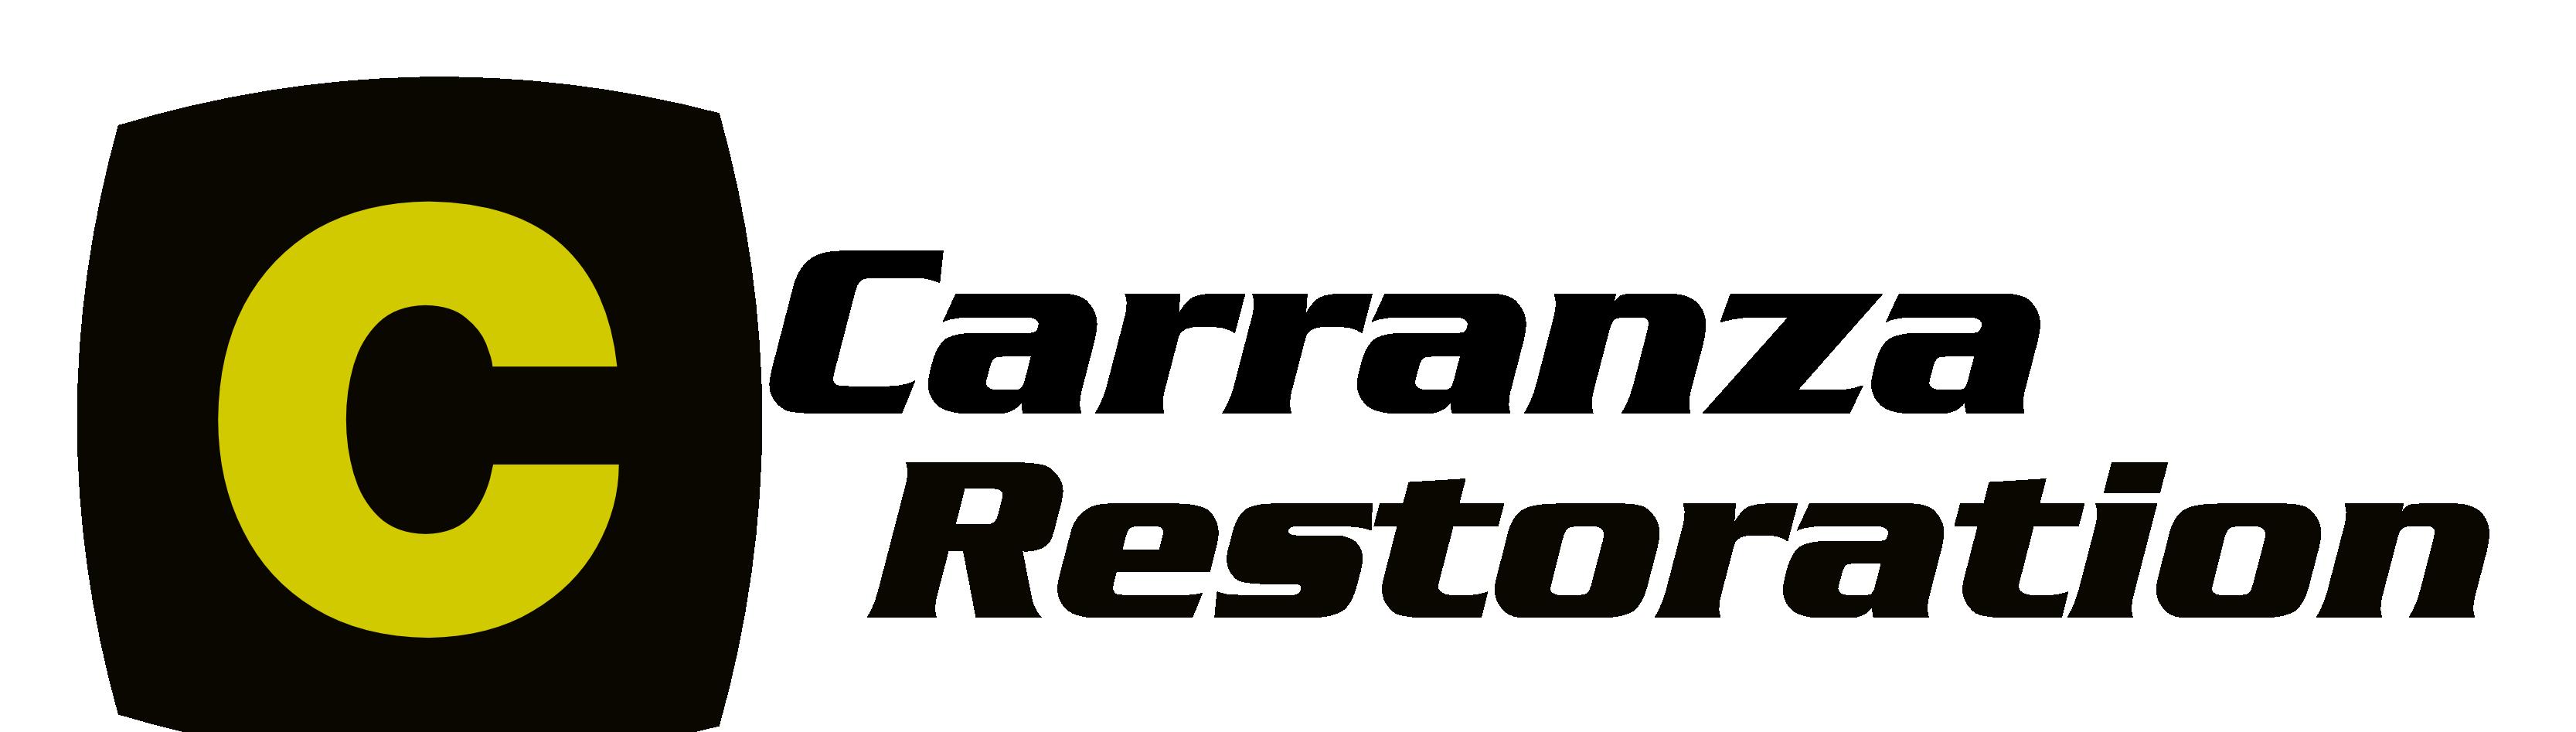 Carranza Restoration Llc Reviews Cibolo Tx Angie S List